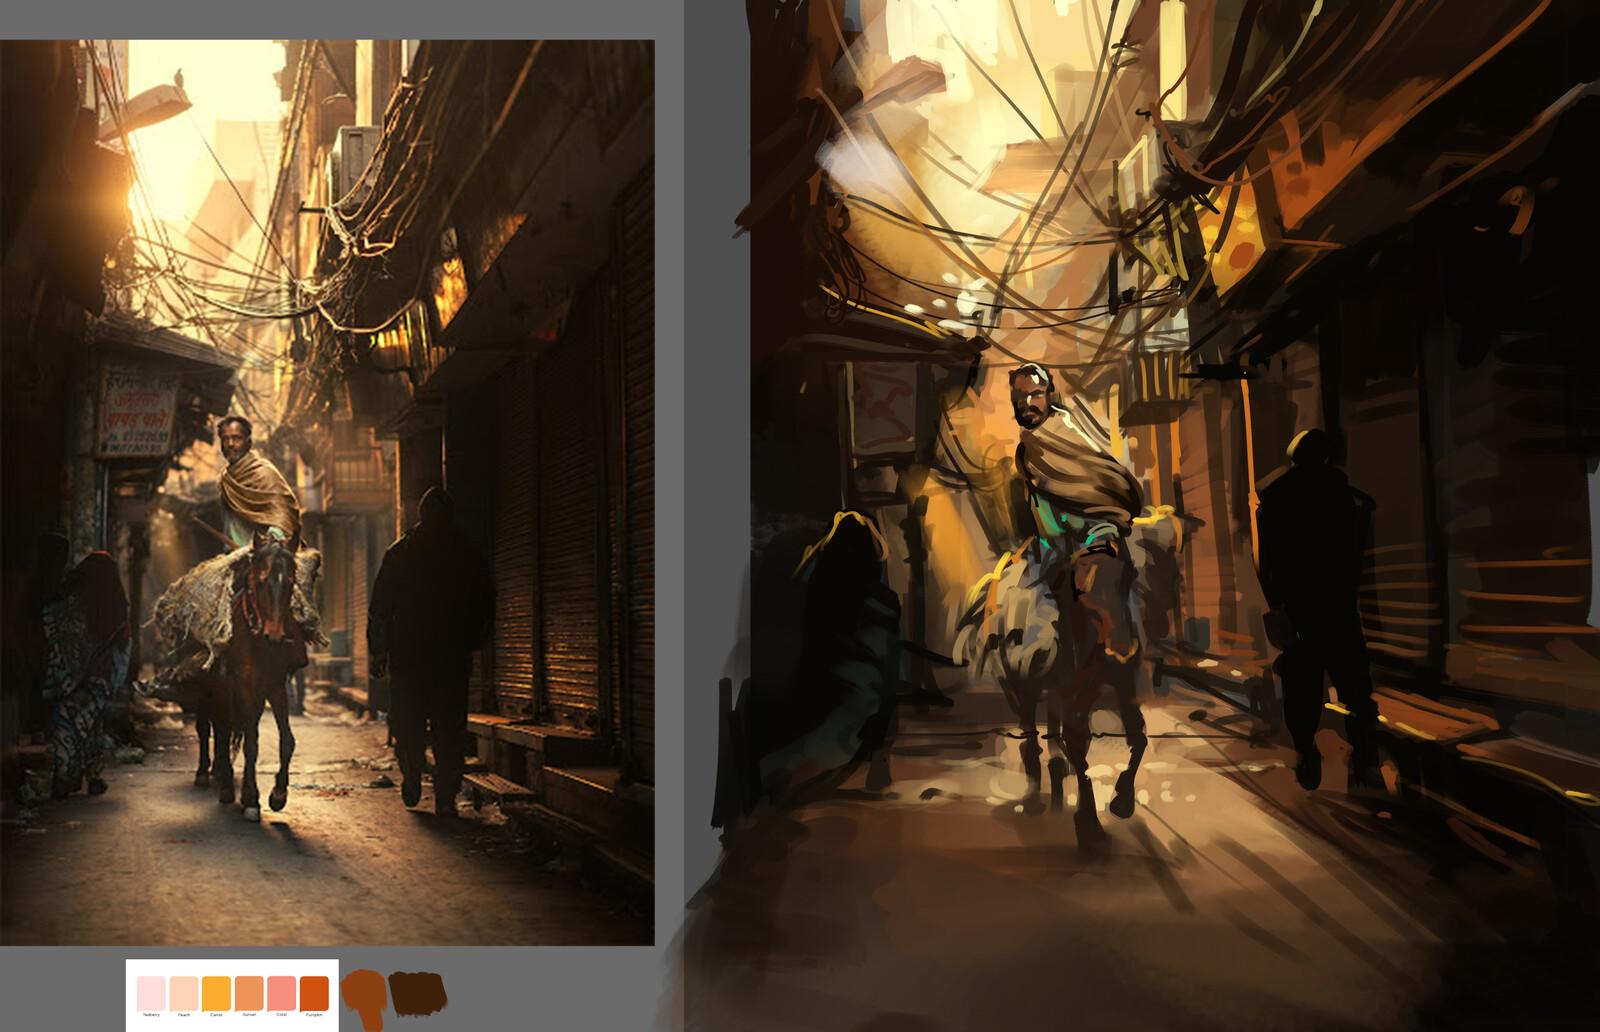 warm color study 2